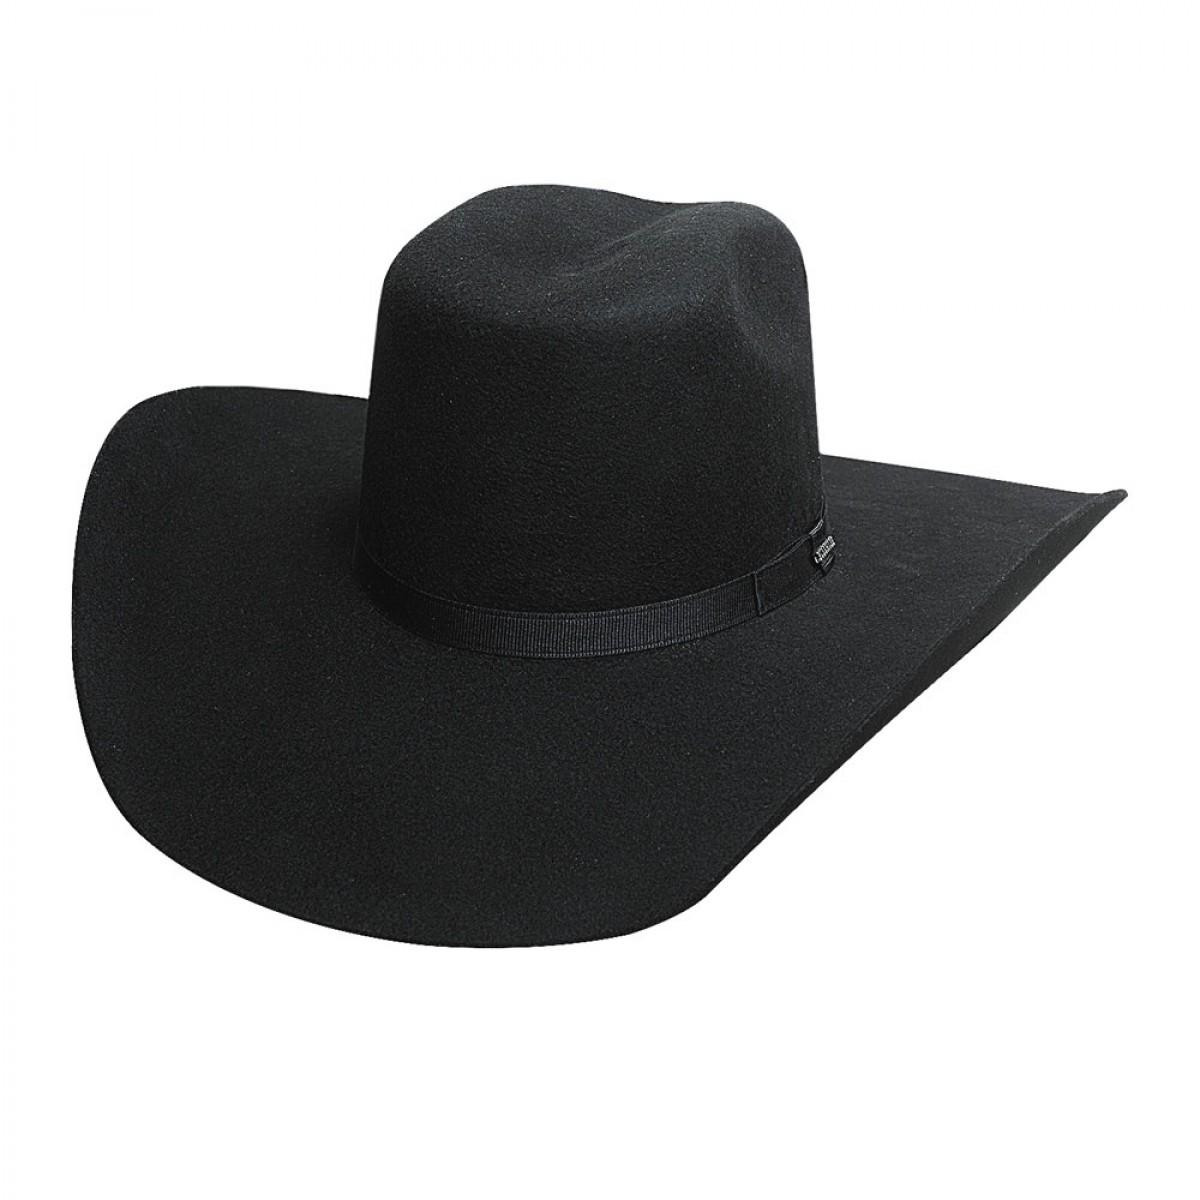 Bullhide Cowboy Hats